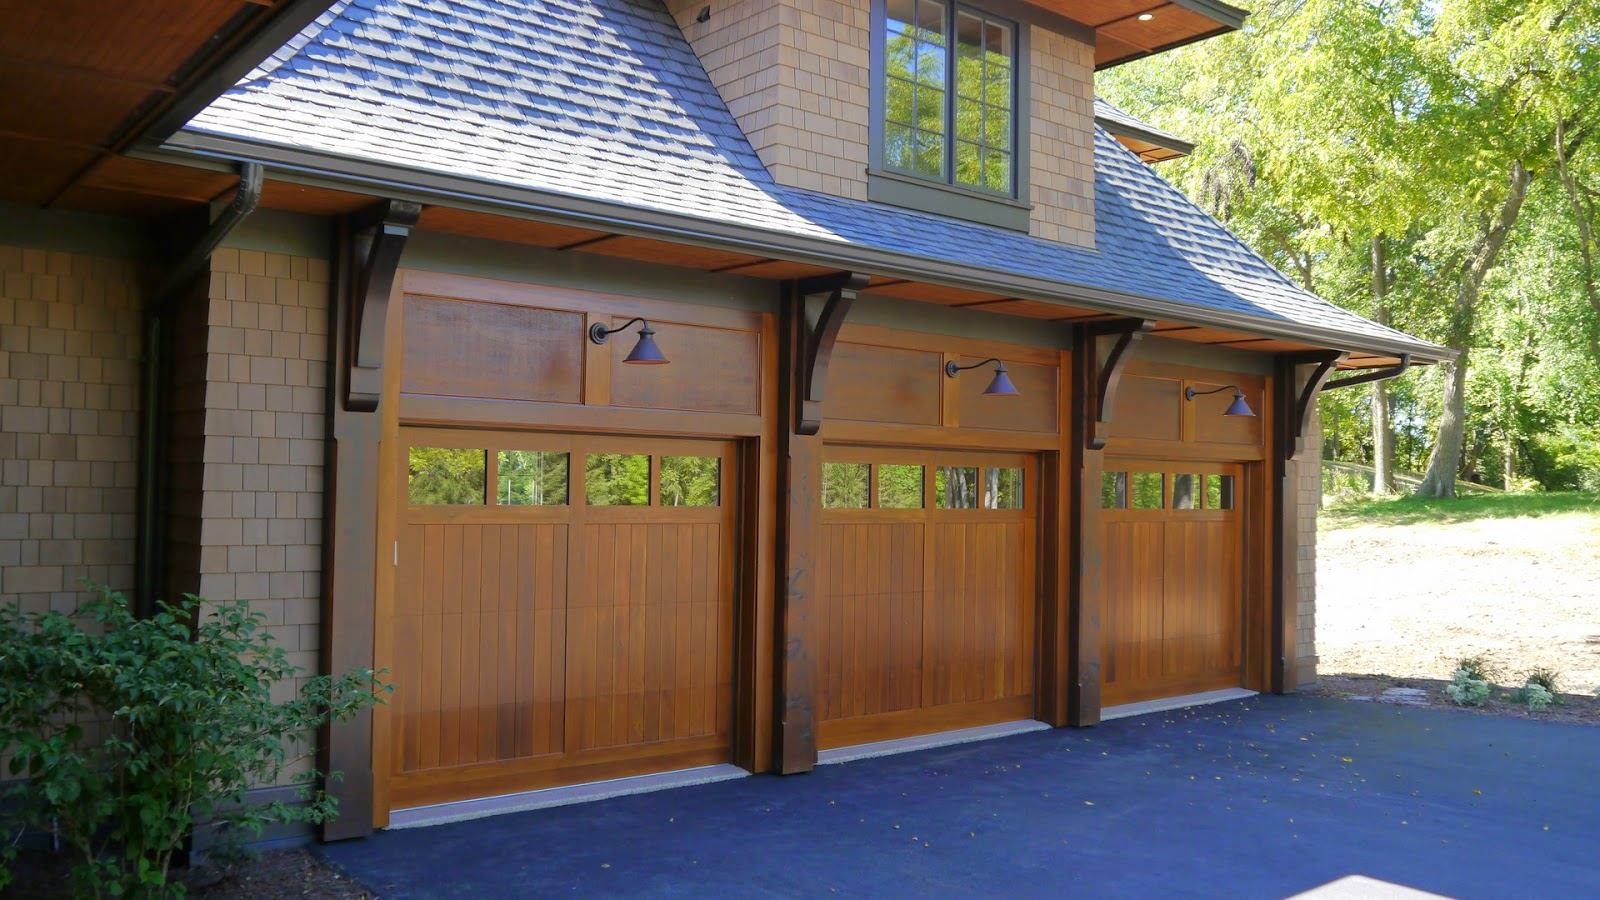 Simply elegant home designs blog september 2014 for Simply elegant home designs